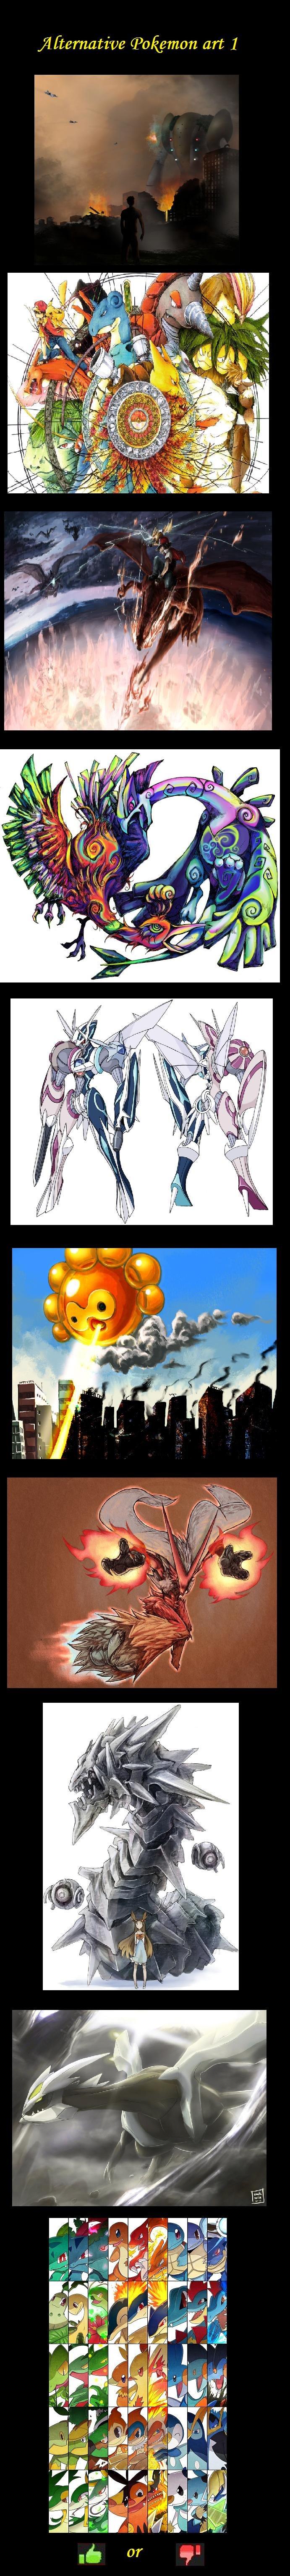 Alternative Pokemon Art. found these on the interwebz I've got plenty more so ill be making more comps dedz to original artists heres eeveelutions art: /funny_p Pokemon Alternative Art